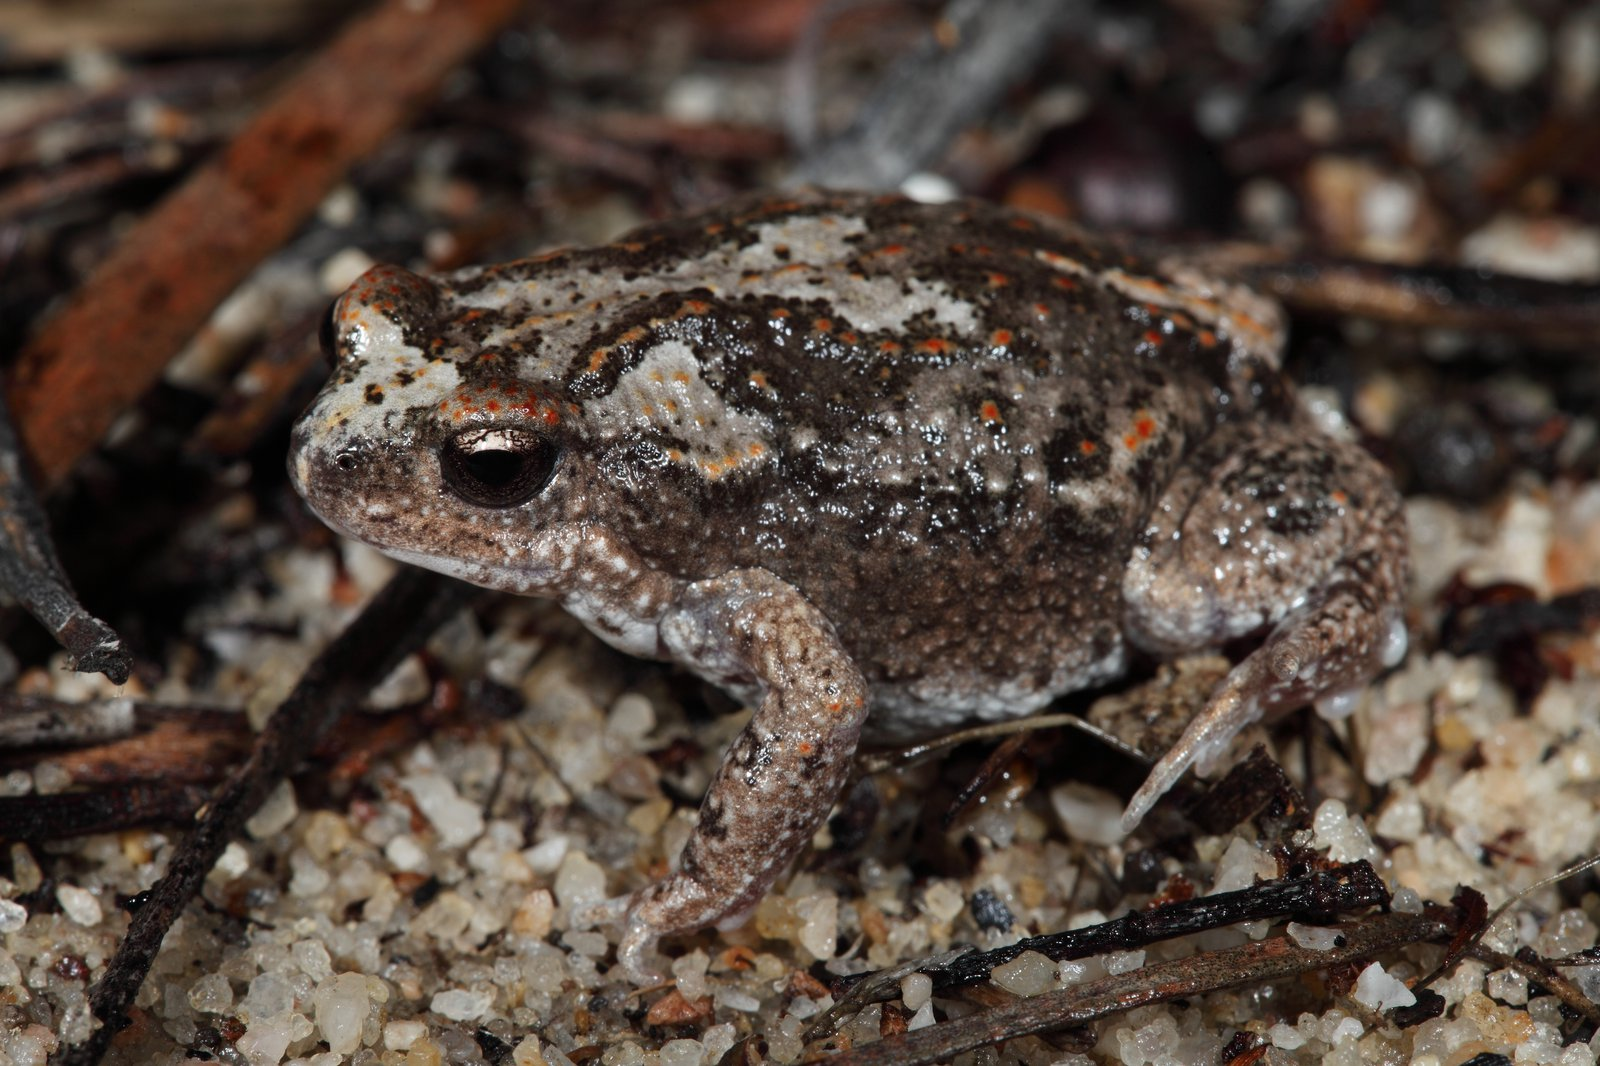 FrogID Week 2019